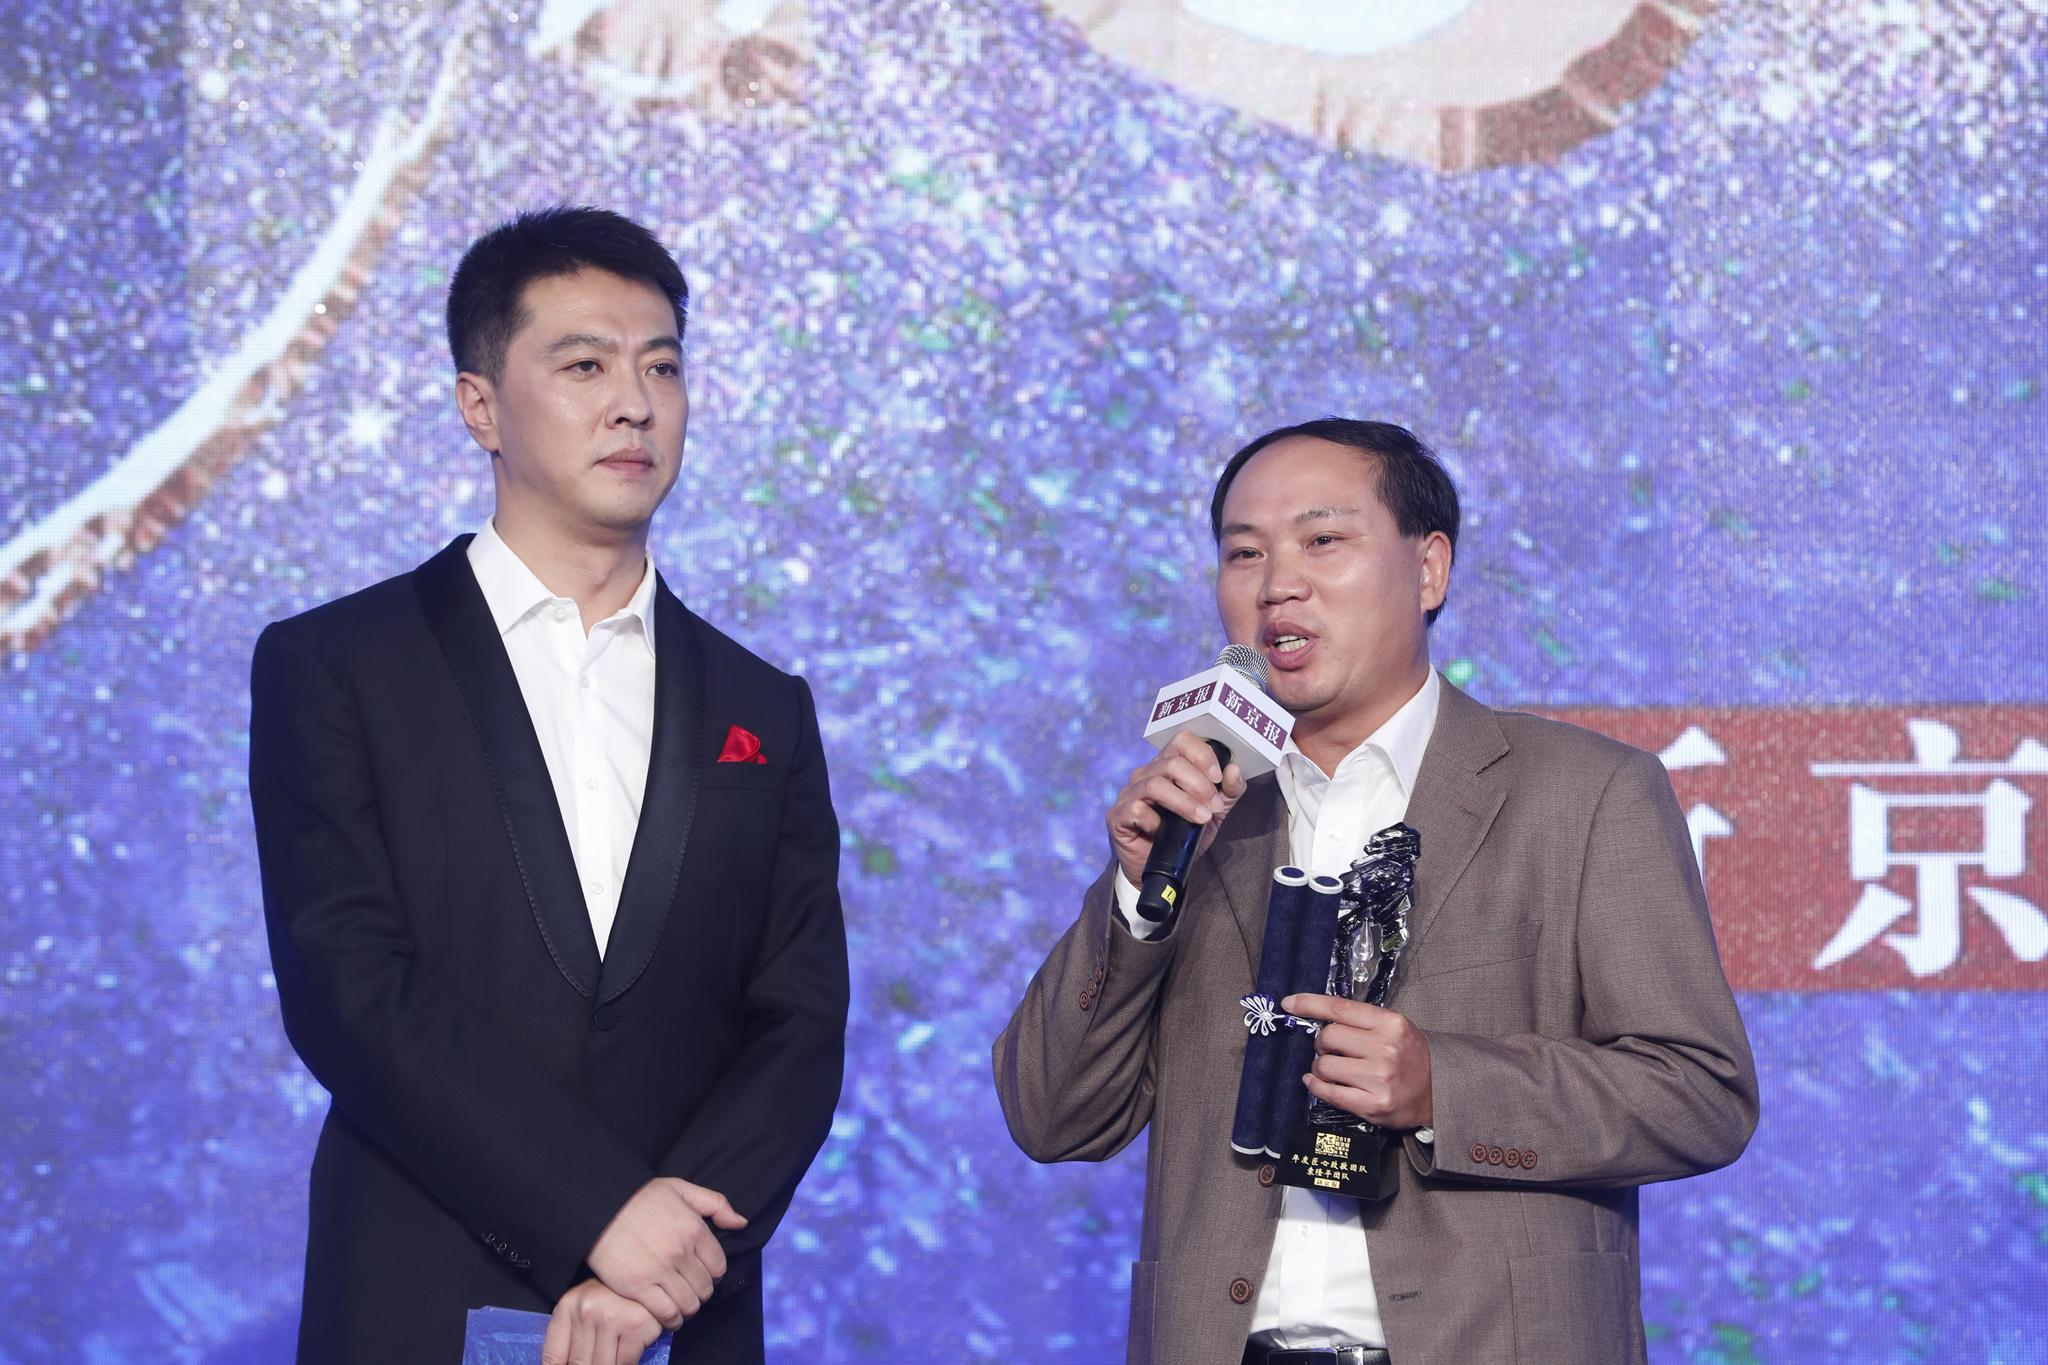 http://www.jywjkt.com/shehuiwanxiang/282183.html